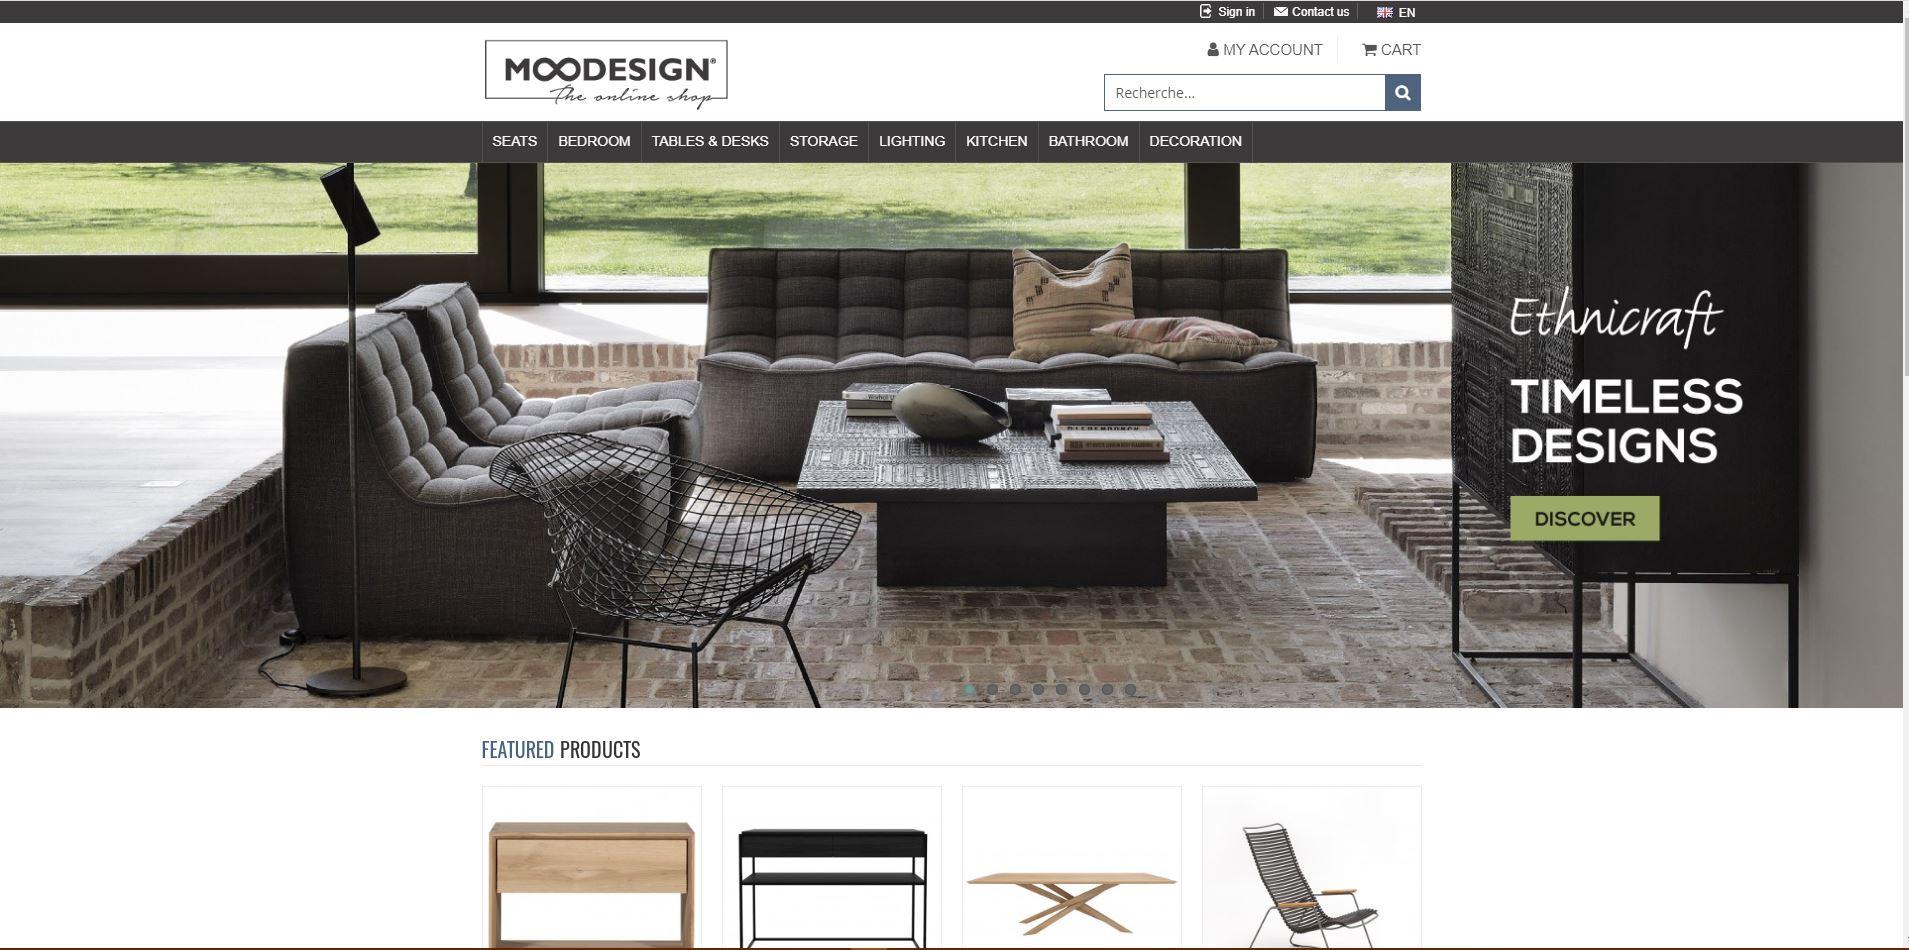 Moo-Design-Digital-Marketing-Mauritius-Ecommerce